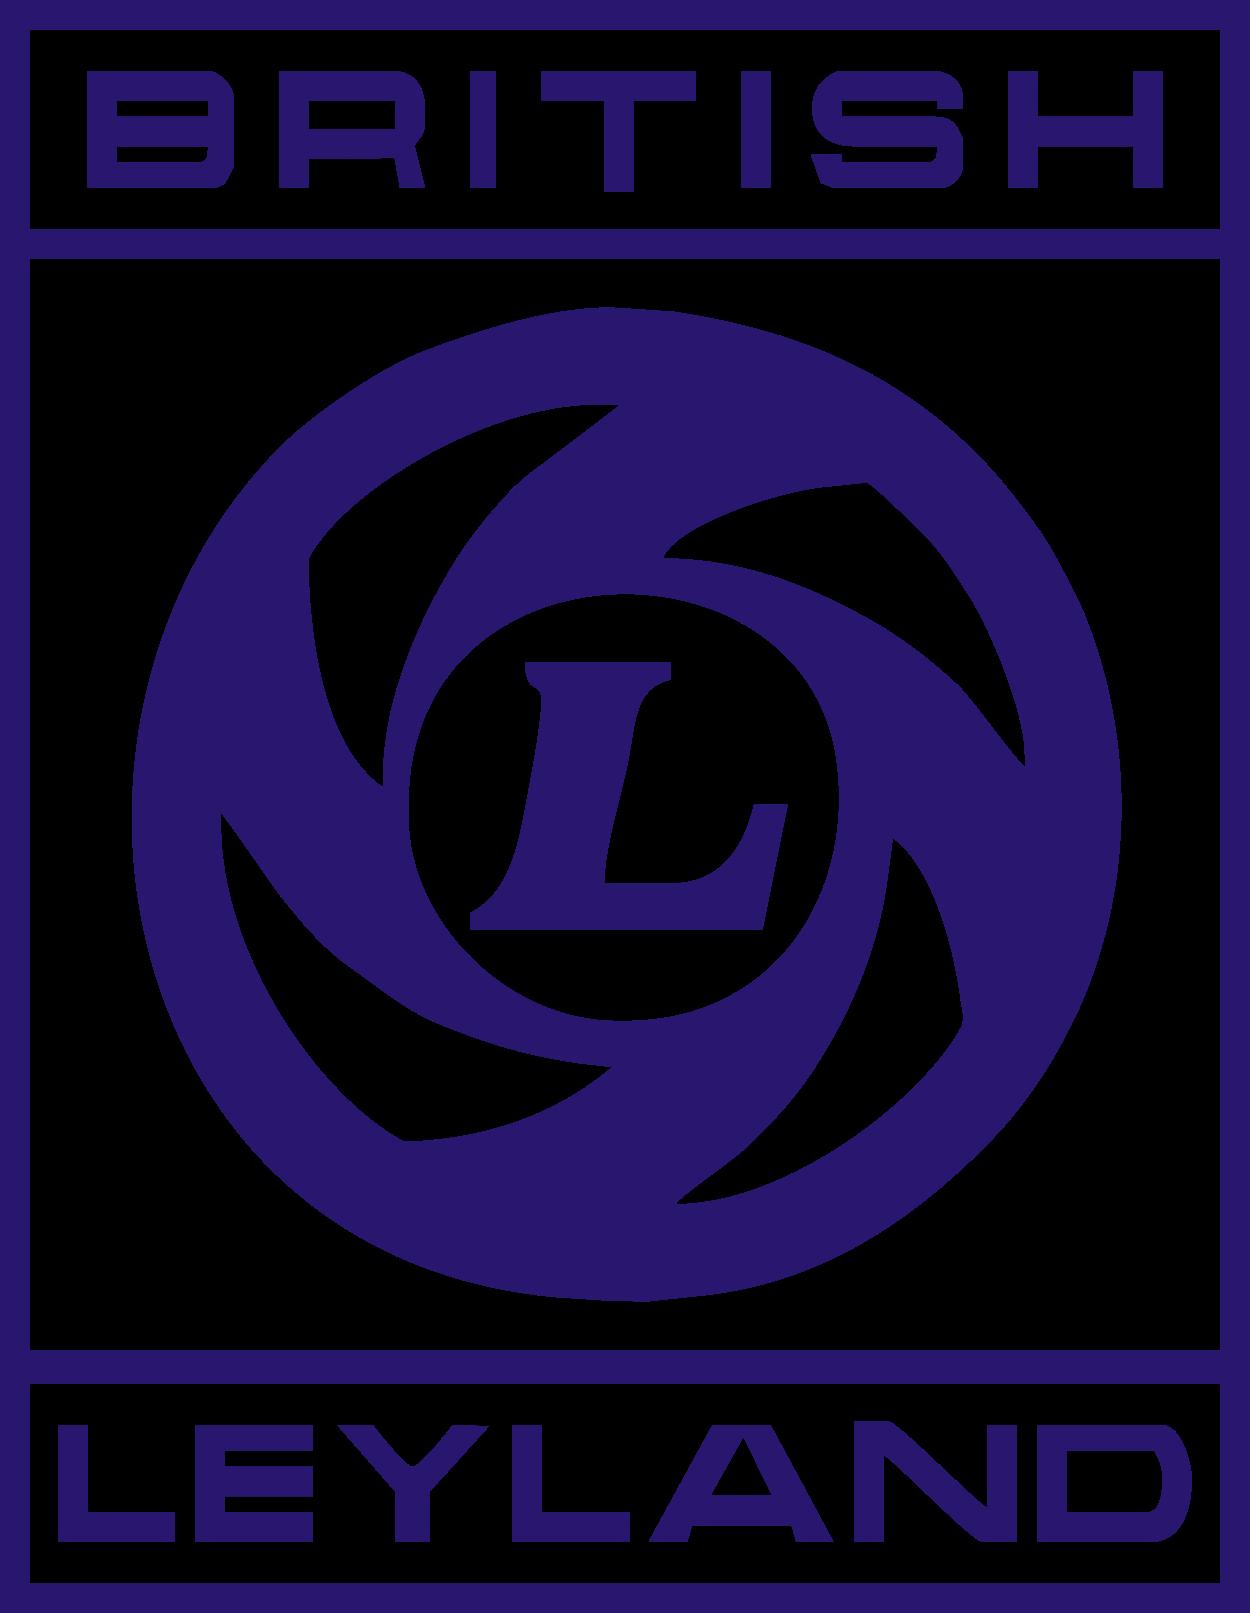 small resolution of british leyland logo